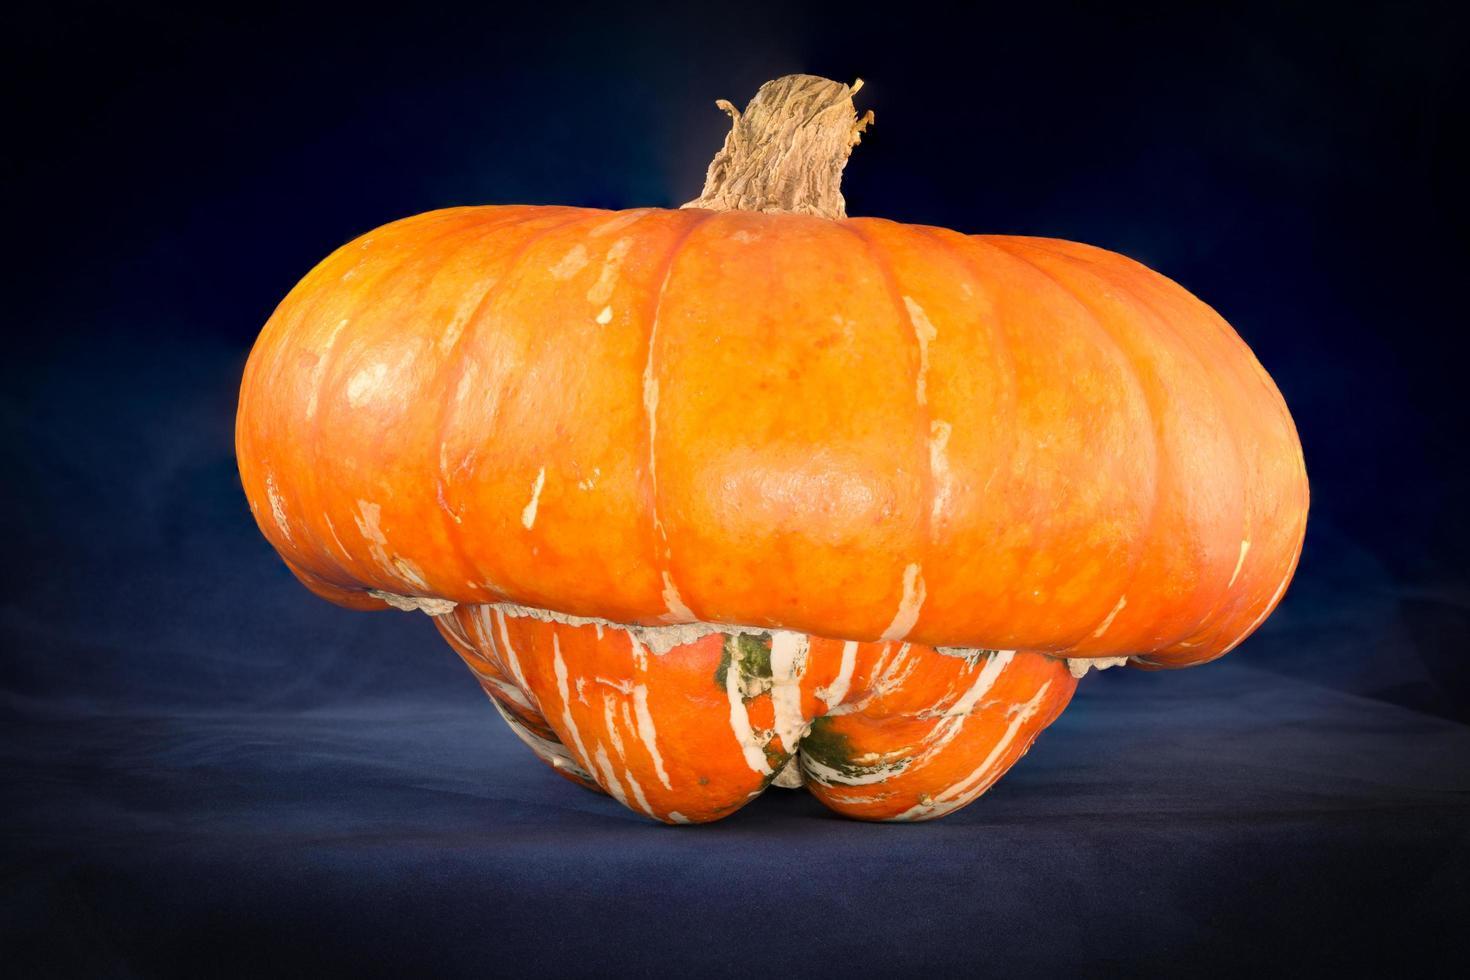 Orange Turban Squash photo